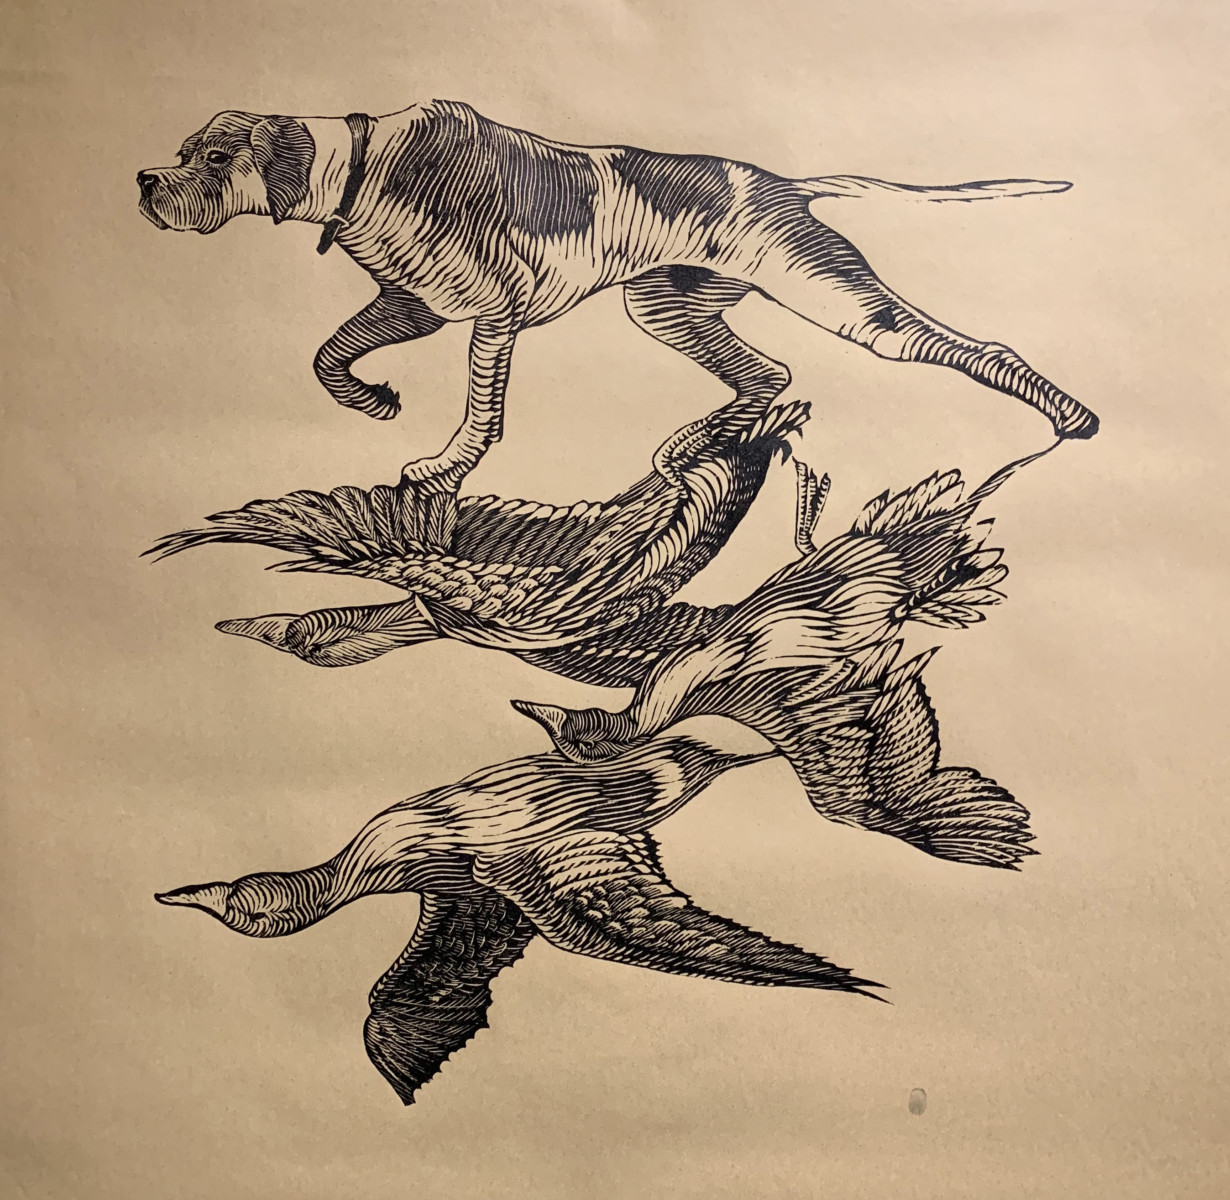 Osmeivy Ortega_HALF MY LIFE_45 x 45 inches_woodcut